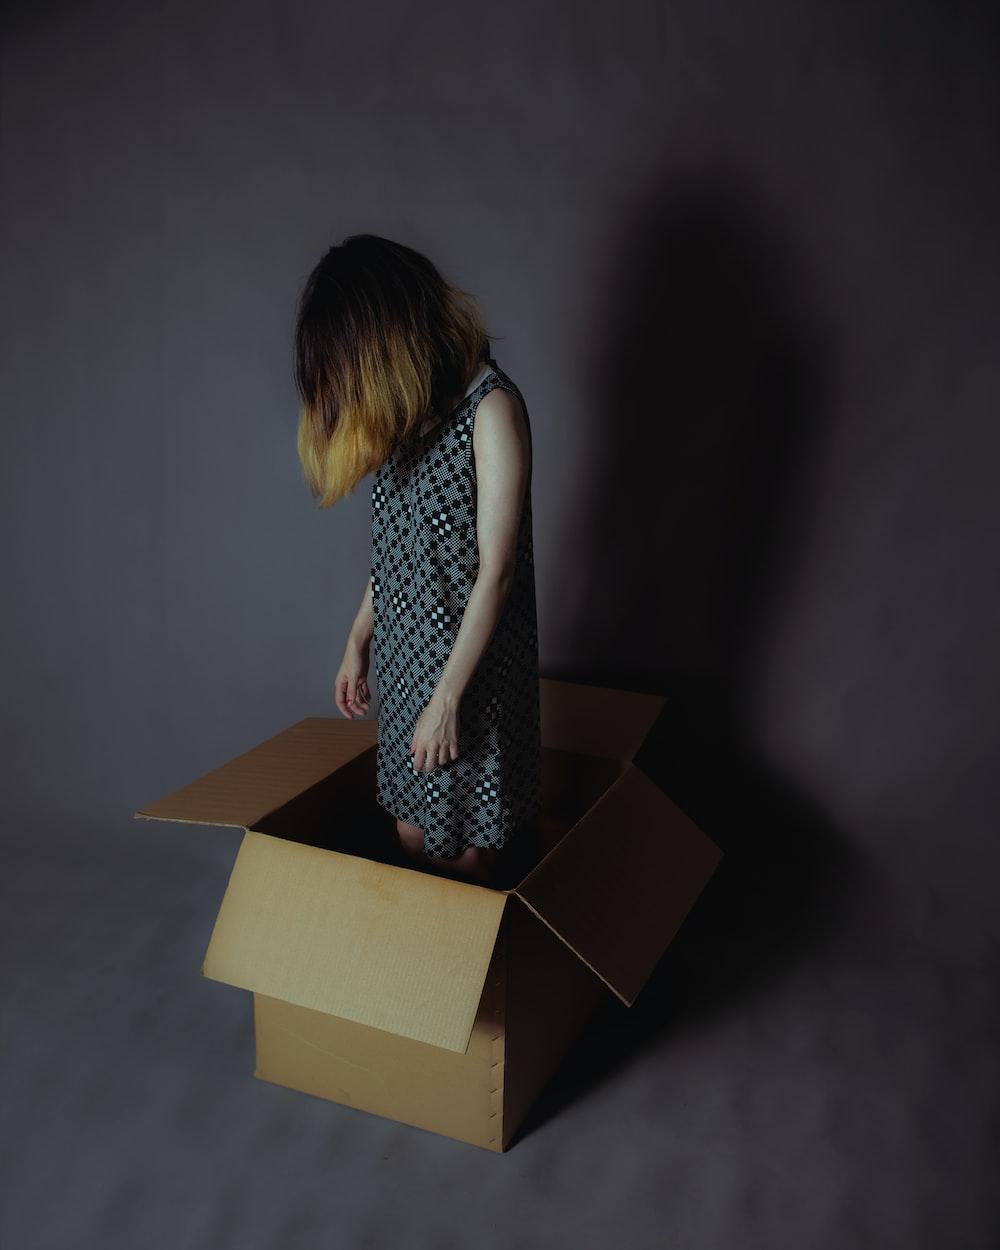 girl wearing gray and white sleeveless dress standing on cardboard box